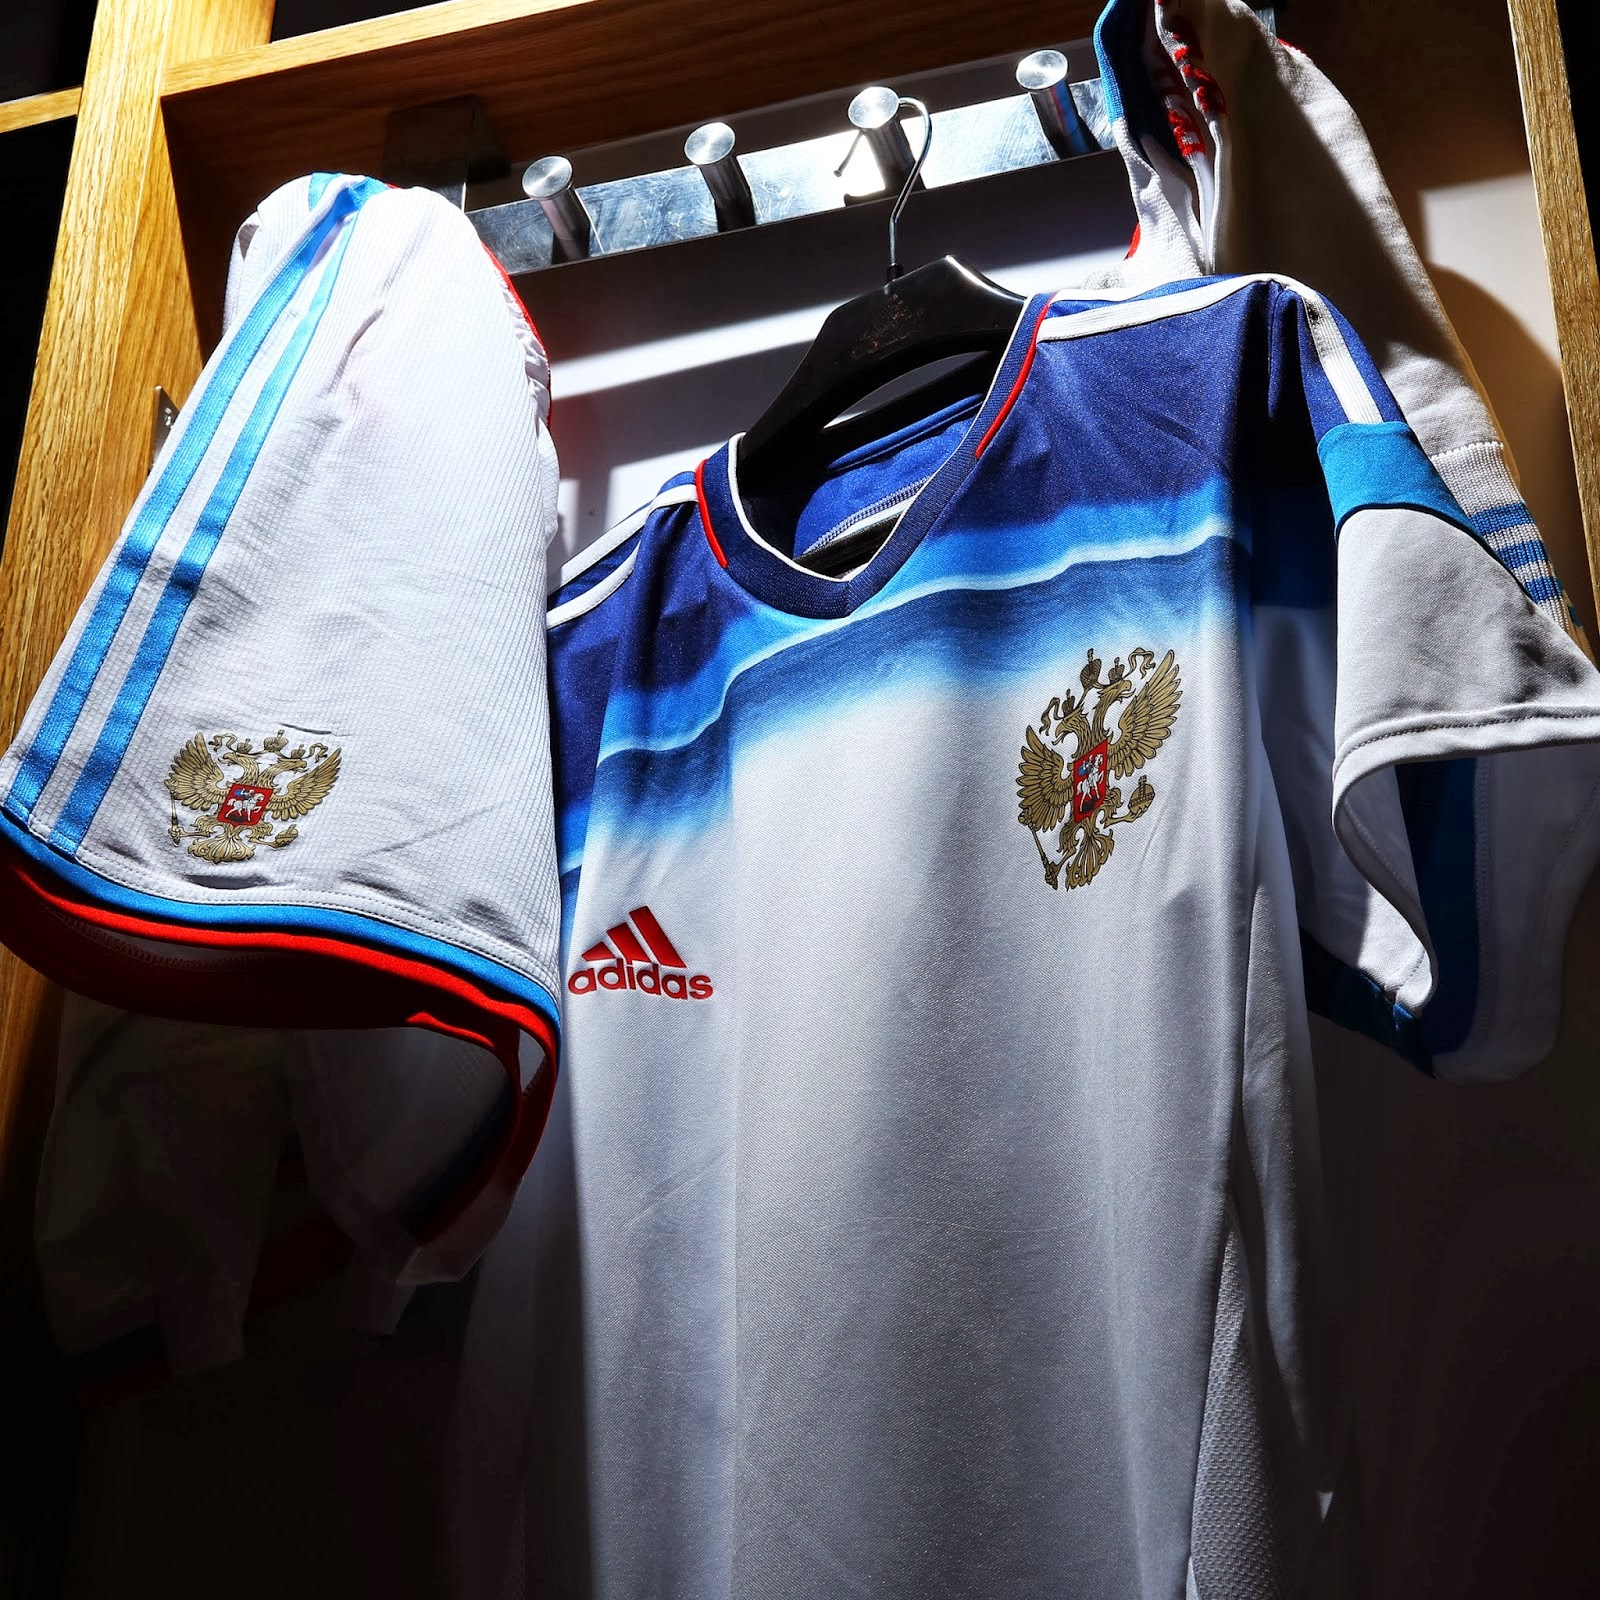 best service 8478a a7a7d adidas Presents New Russian National Football Team Away Kit ...